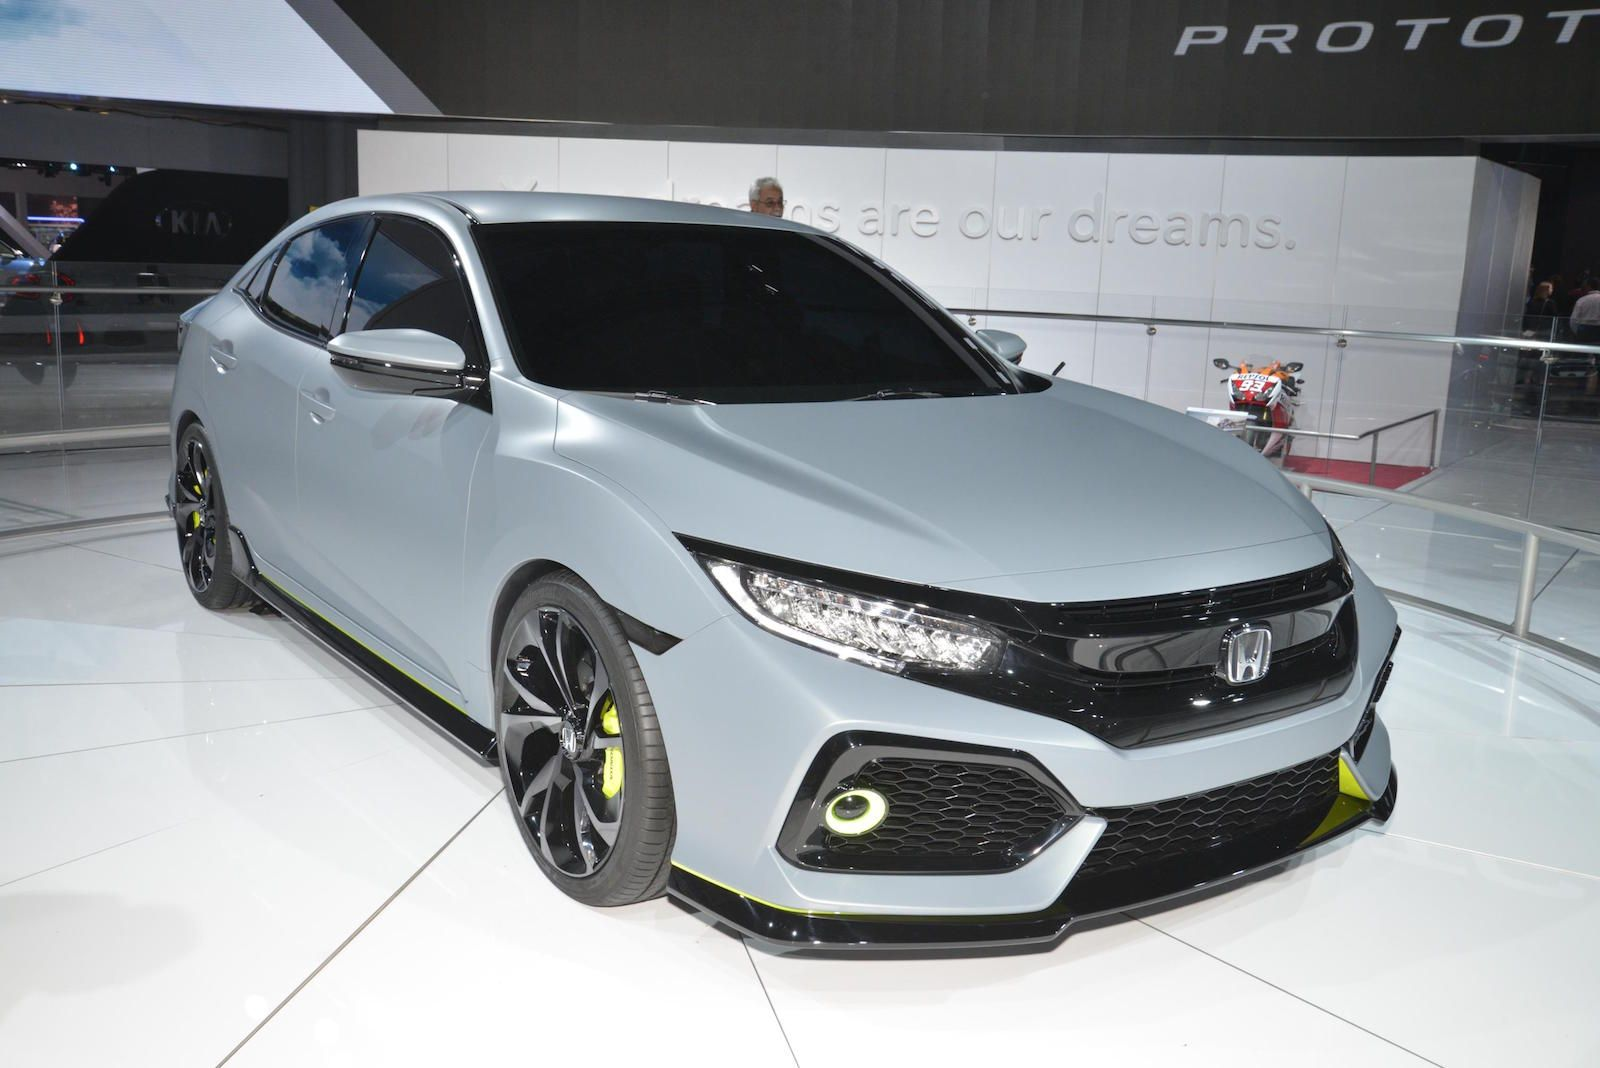 2017 Honda Civic Hatchback to offer turbo engine, 6speed